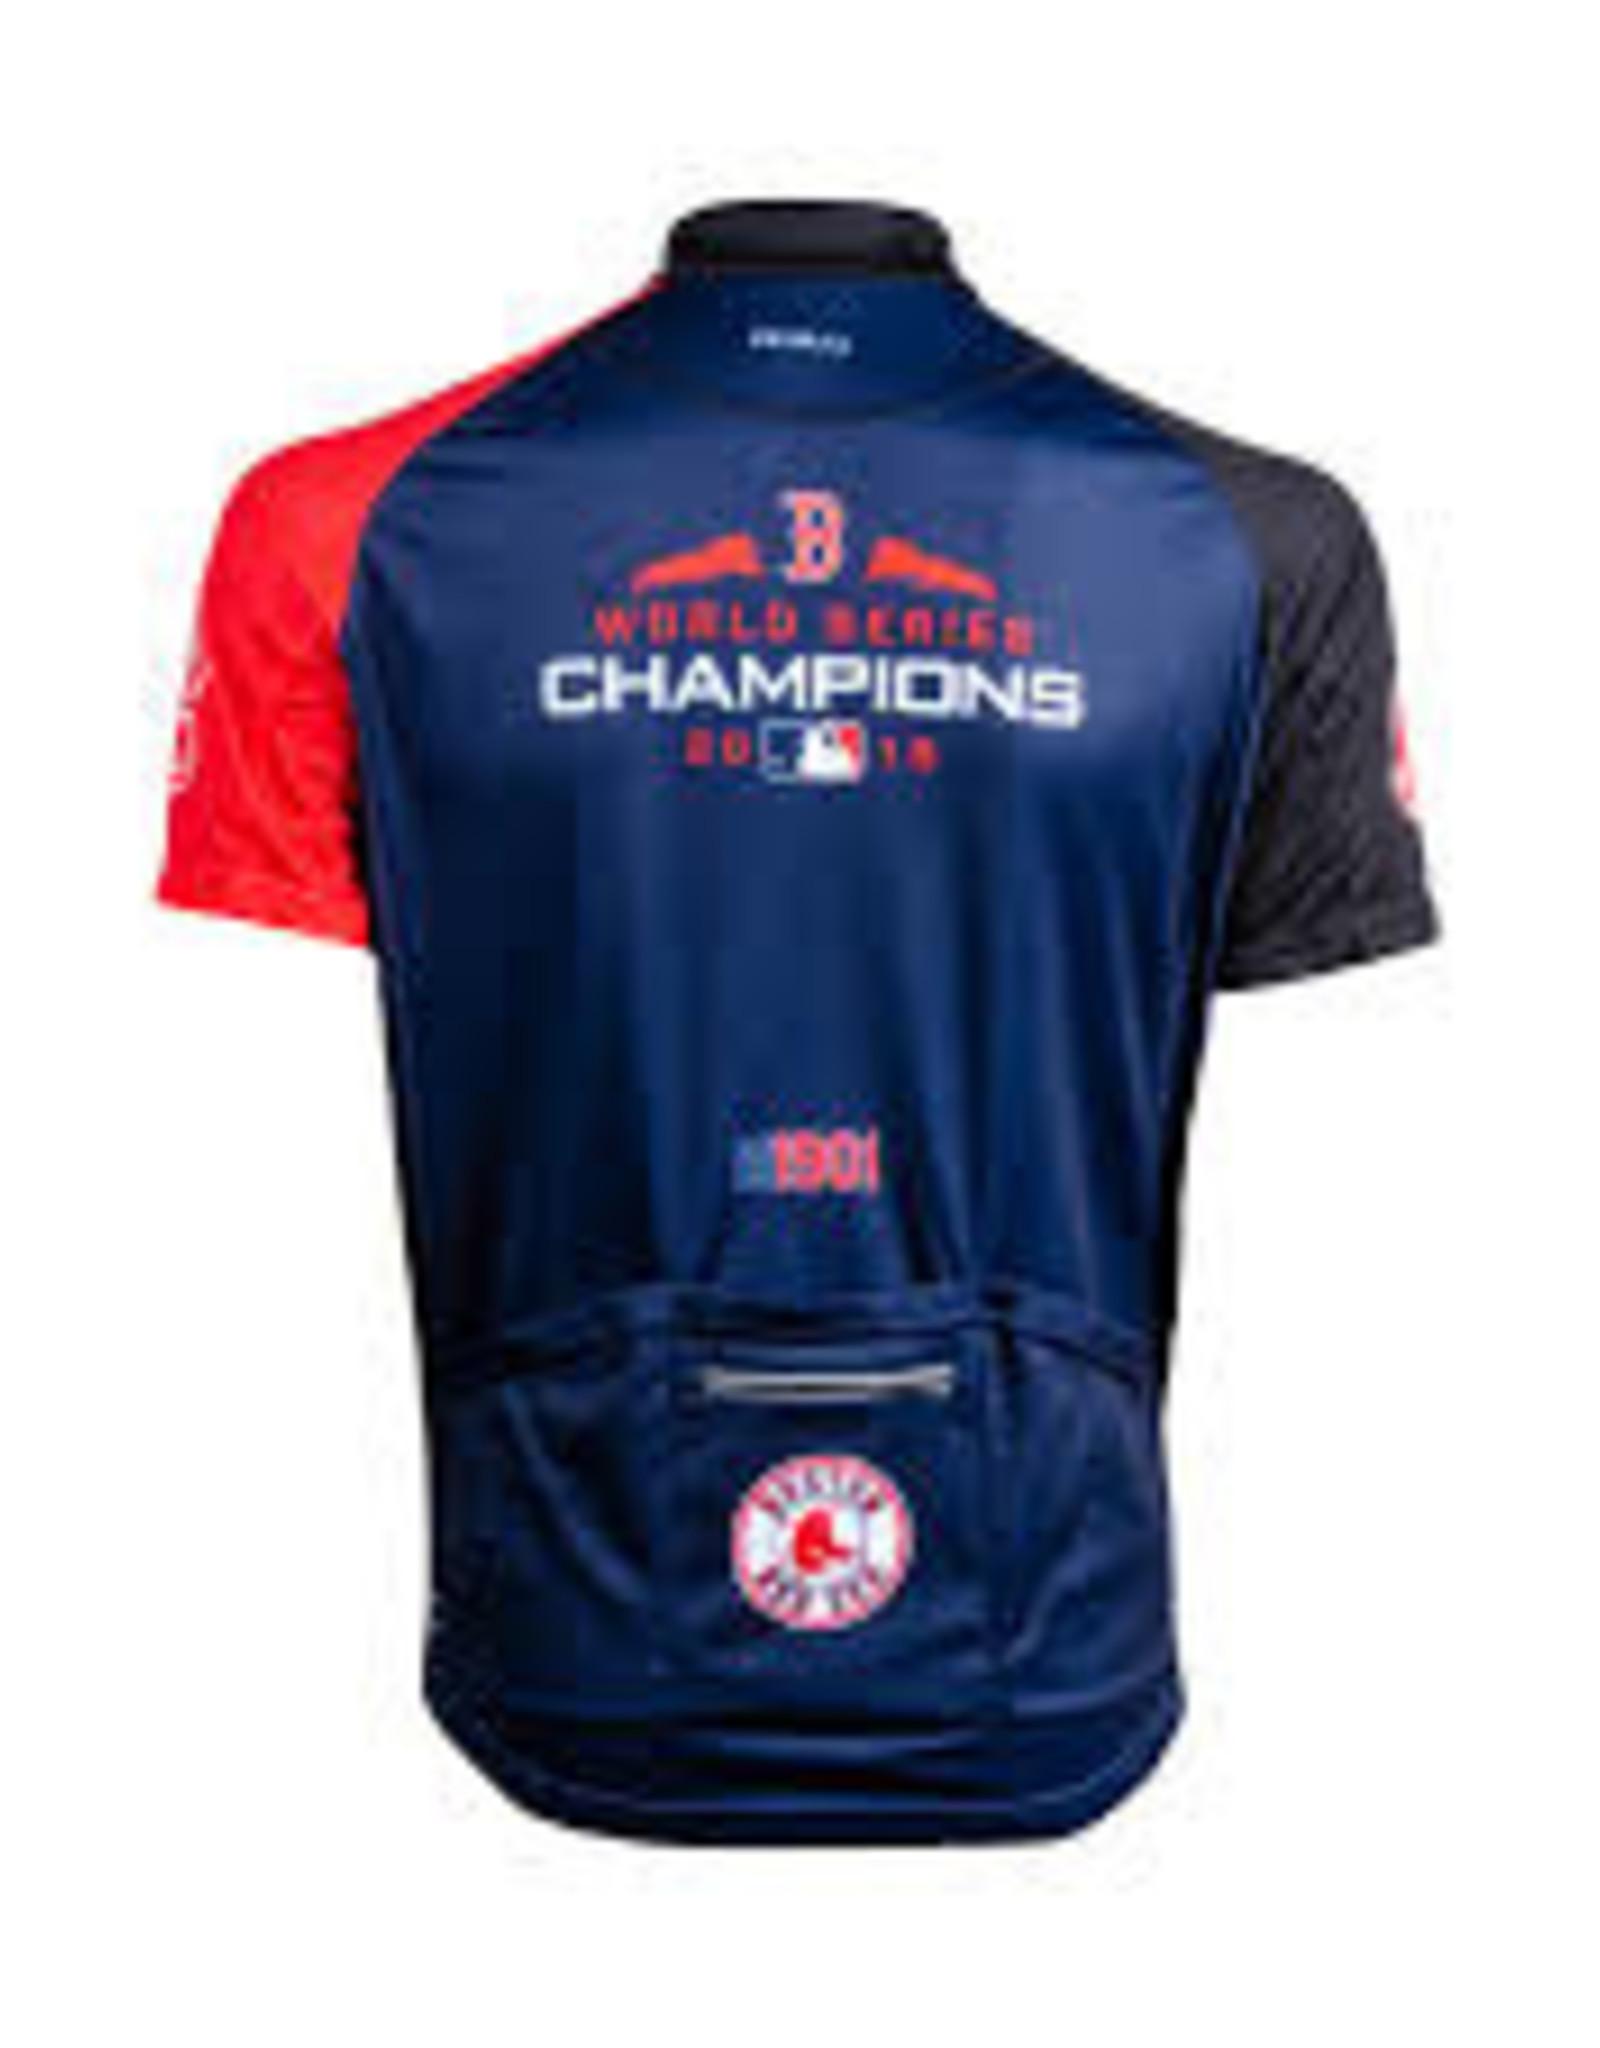 Primal Wear Jersey - Primal Boston World Champions Red Sox